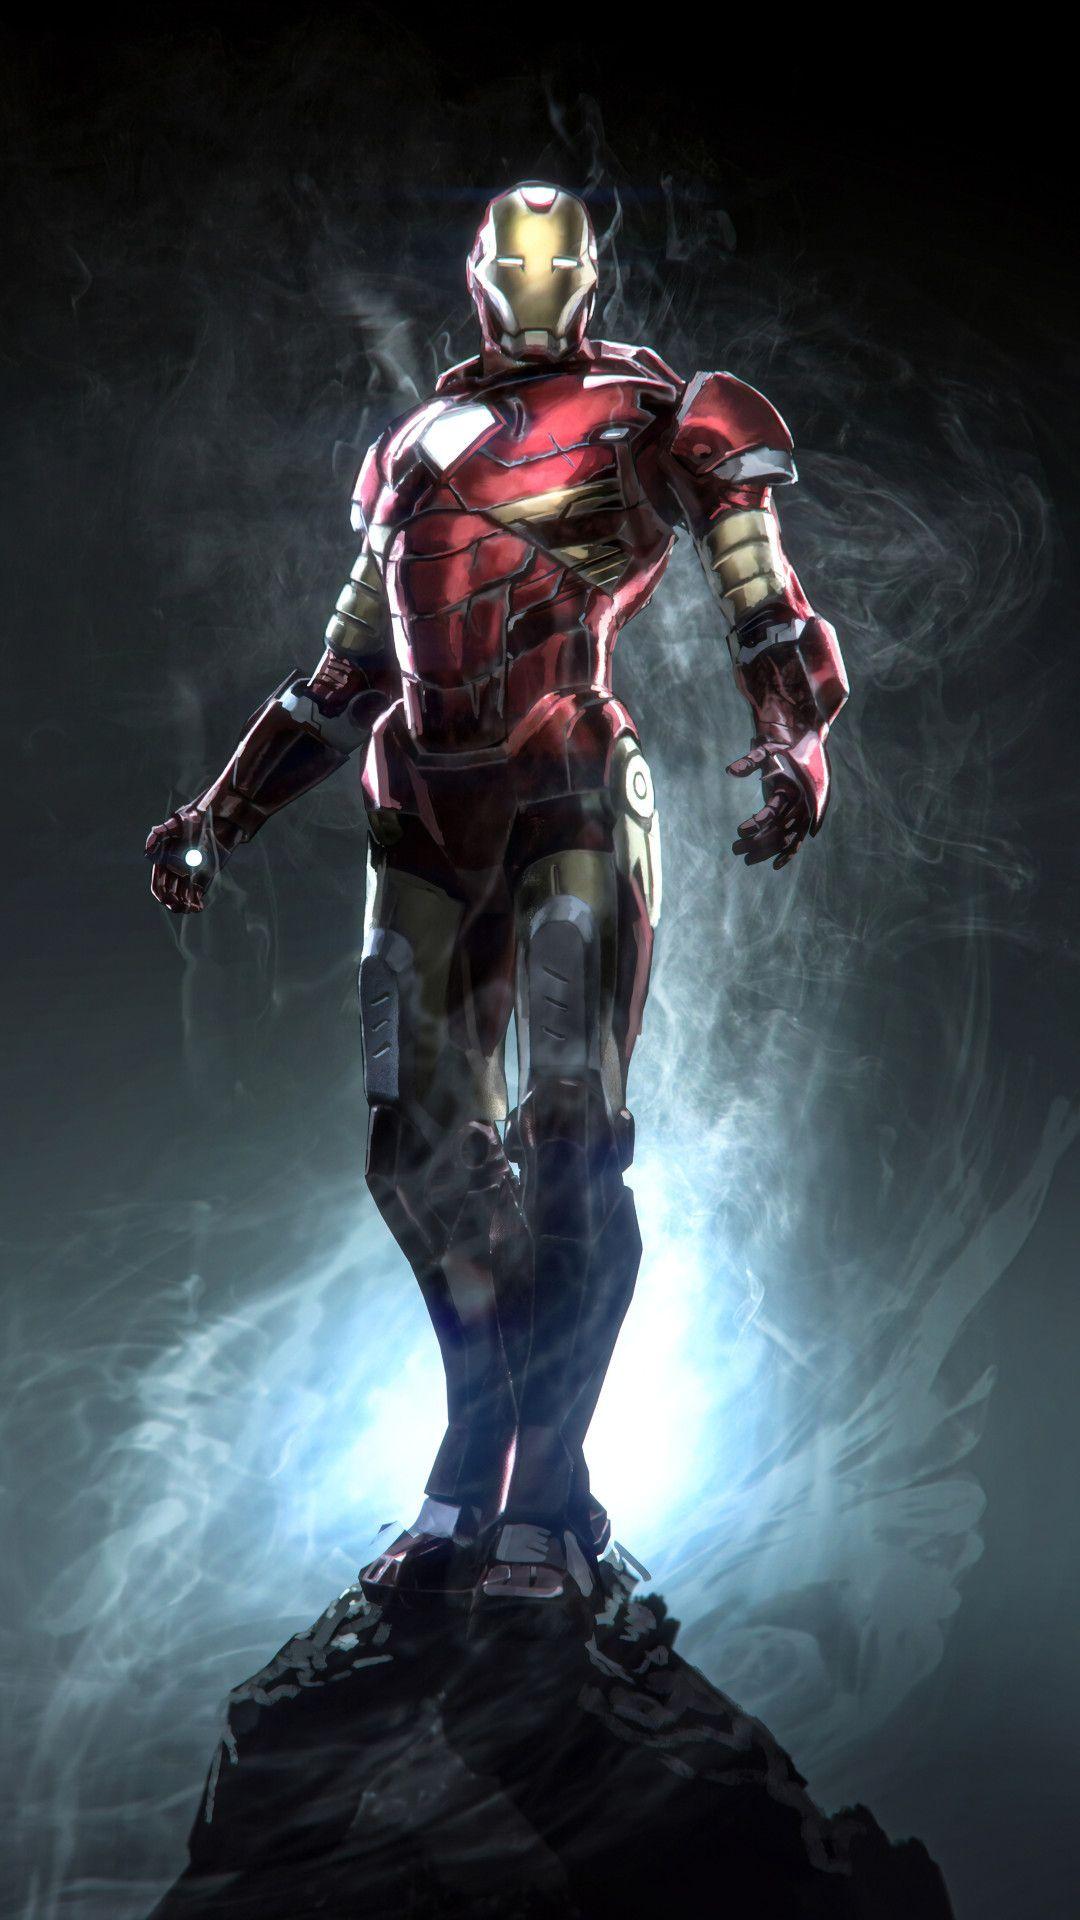 Iron Man Marvel Superhero Mobile Wallpaper (iPhone